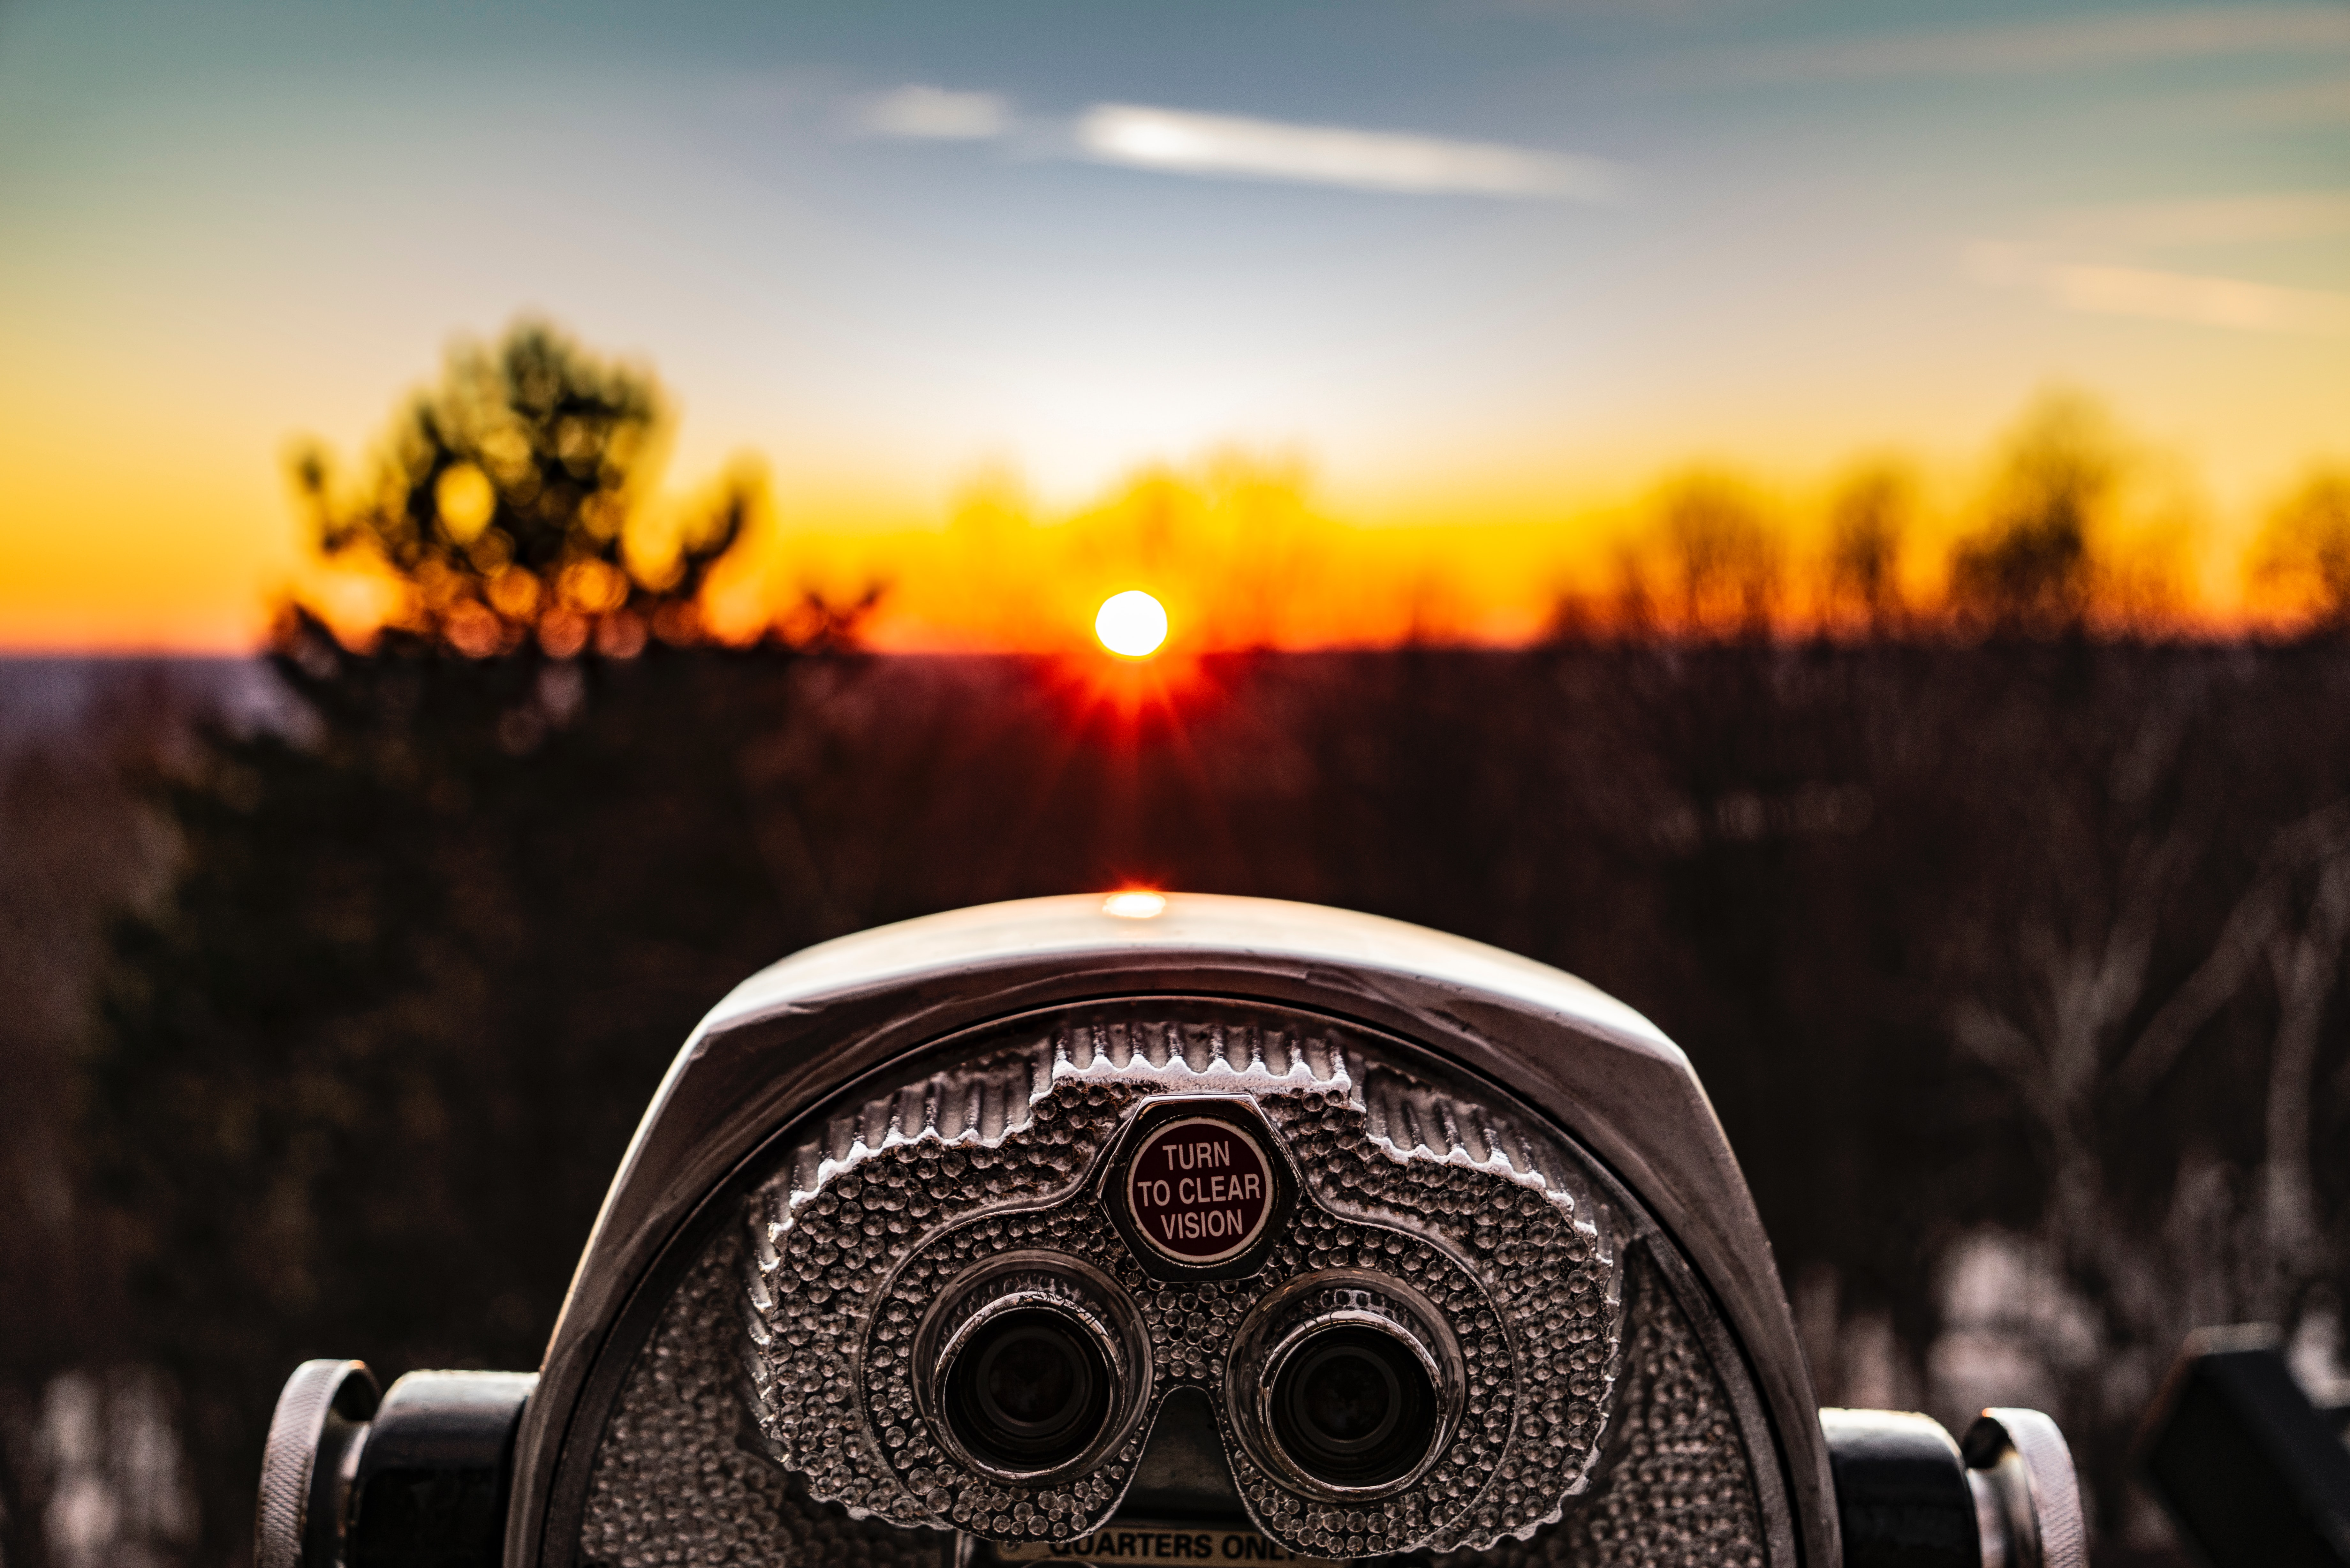 Binoculars looking at a sunset